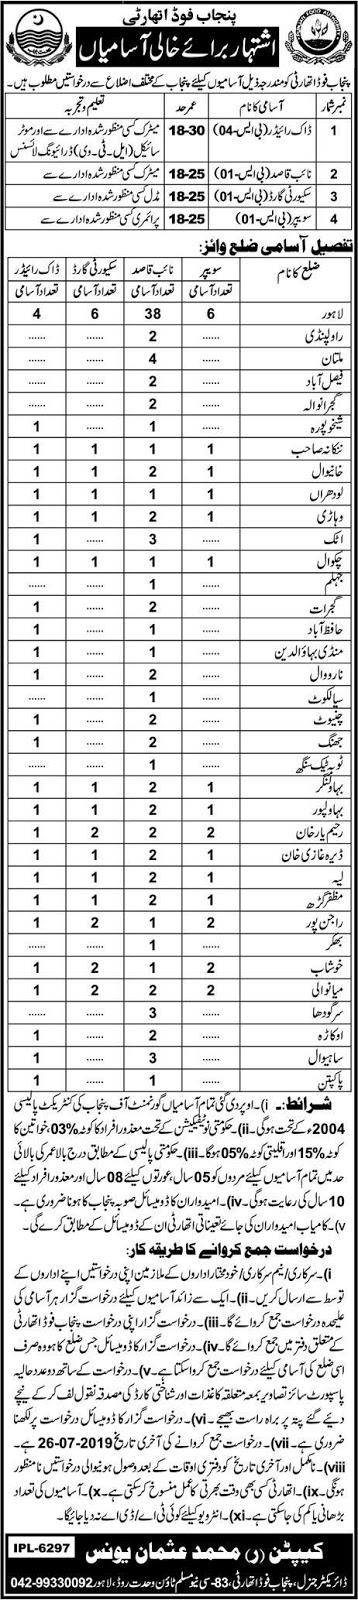 Punjab Food Authority Jobs 2019 - 450+ Jobs